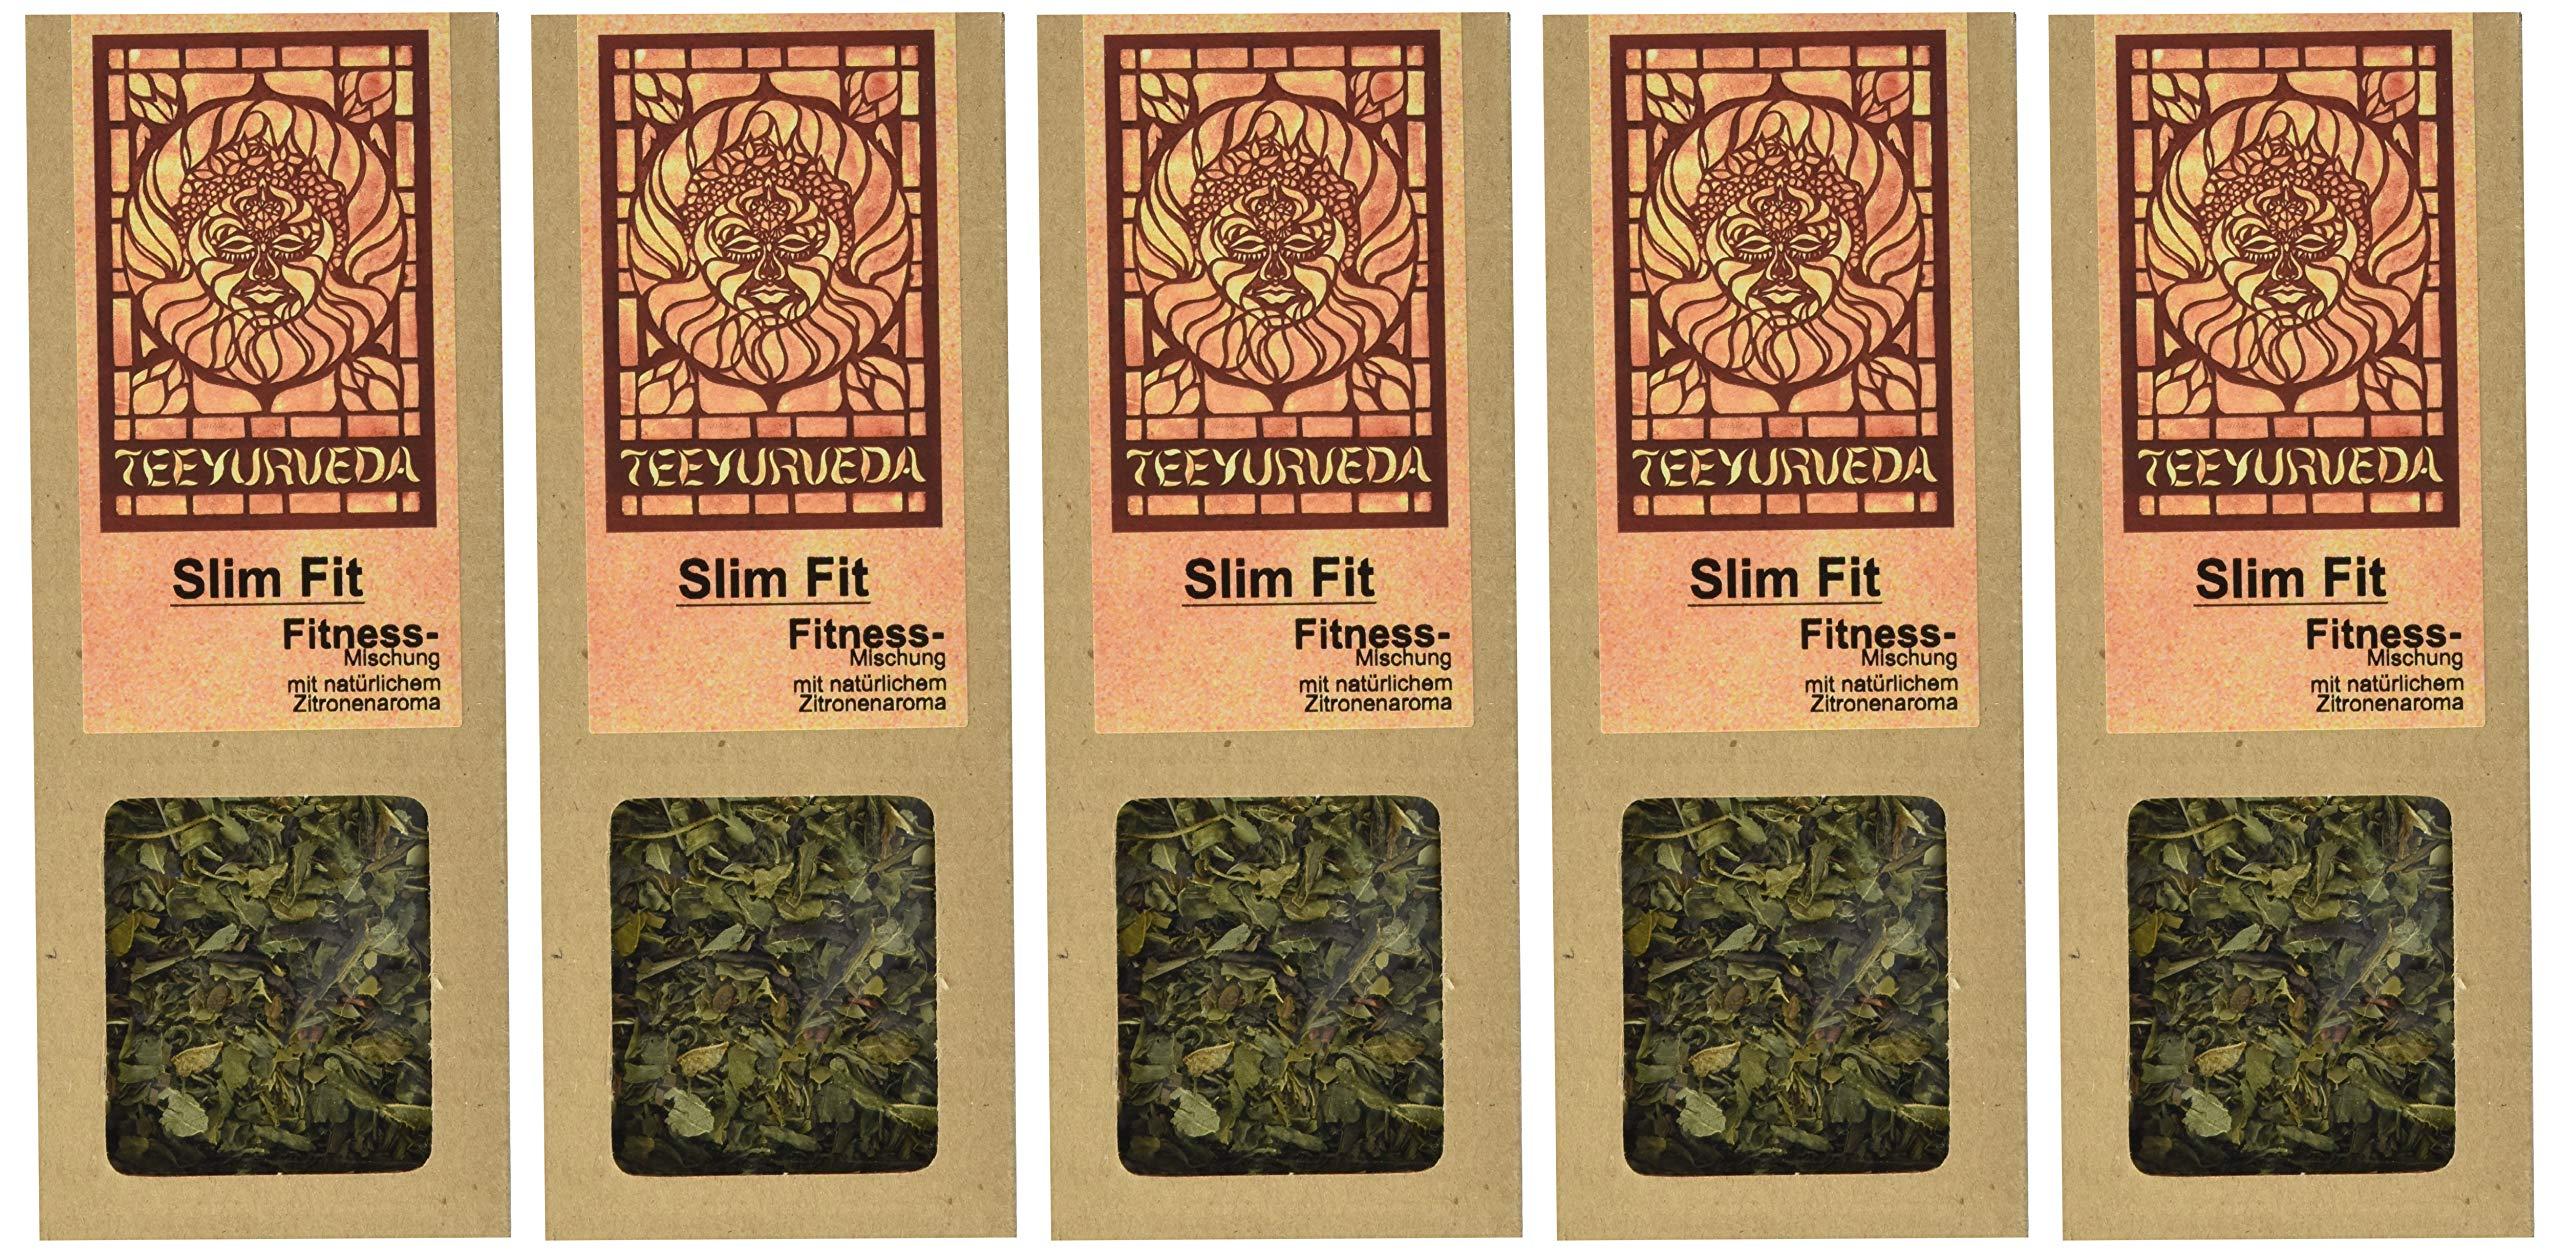 Teeyurveda-Slim-Fit-Teemischung-aromatisiert-5er-Pack-5-x-71-g